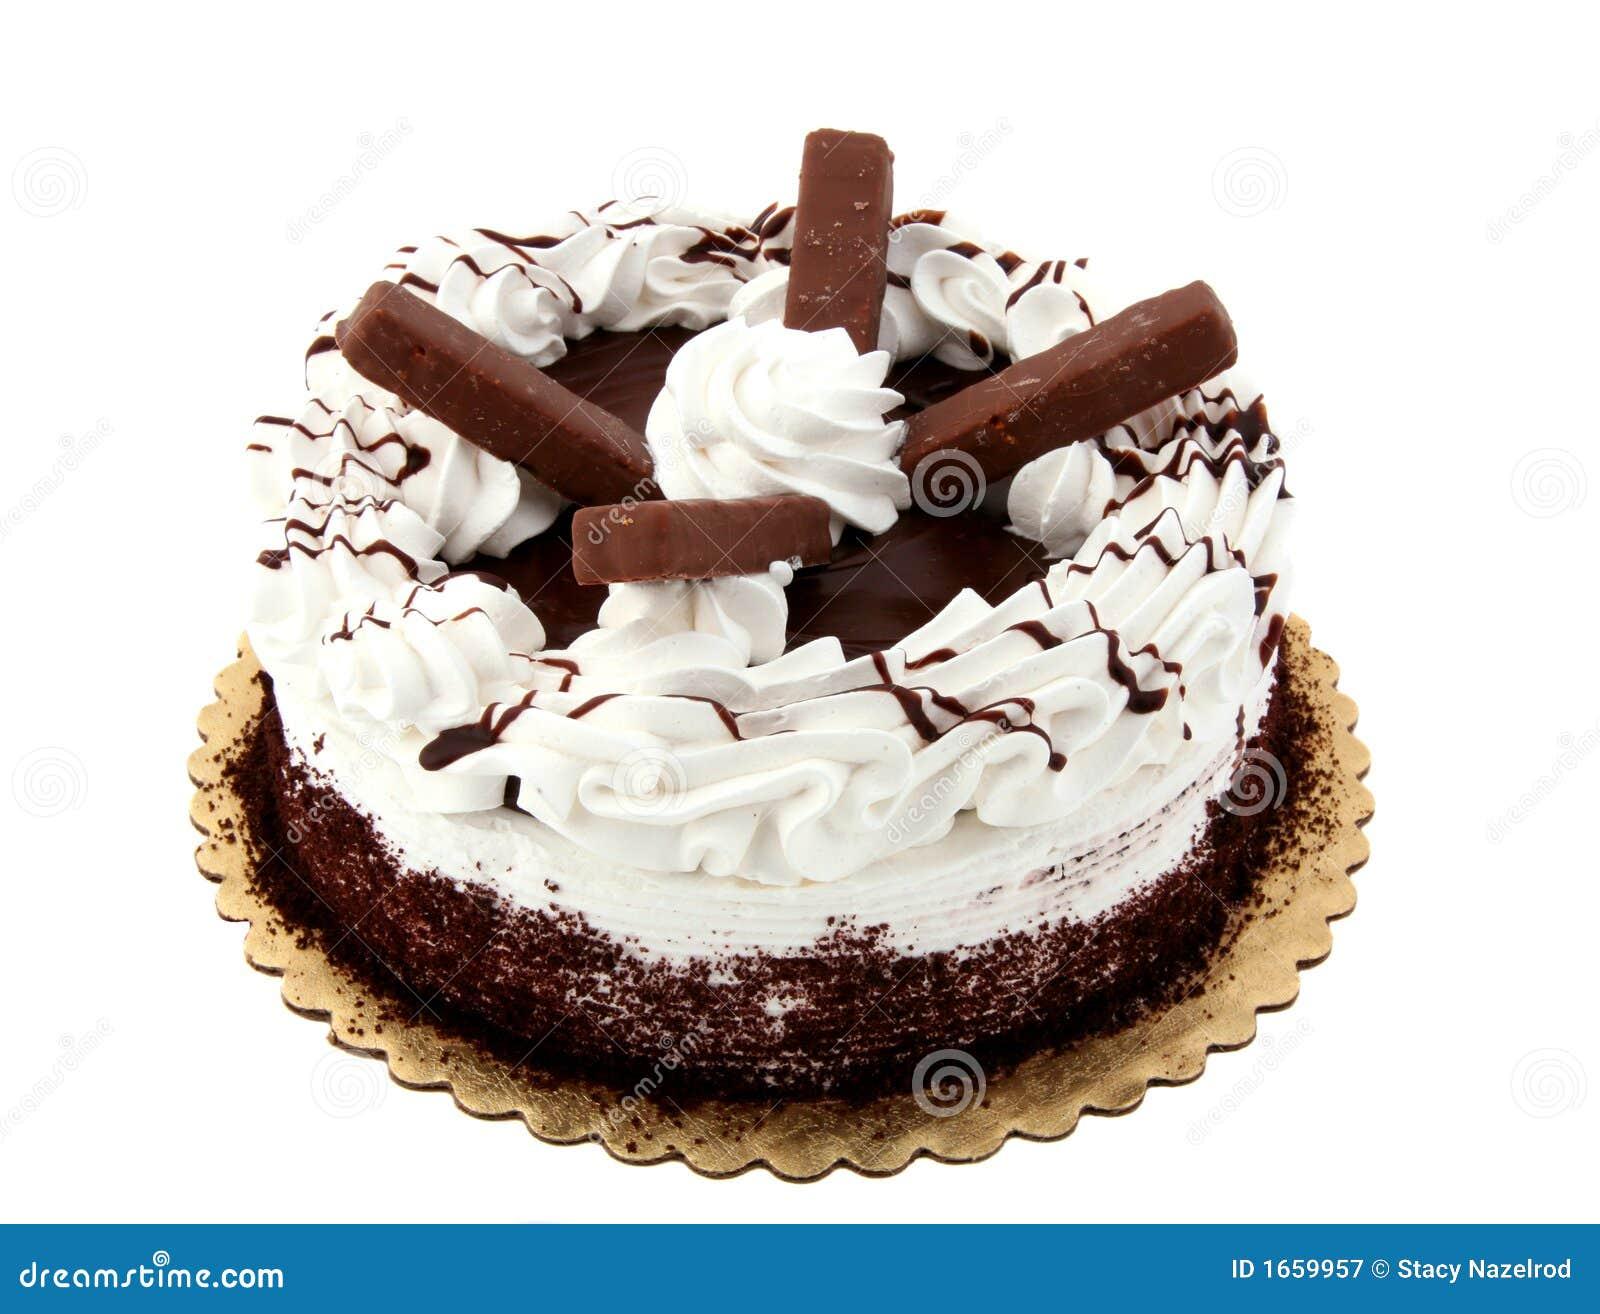 Chocolate Stollen Cake